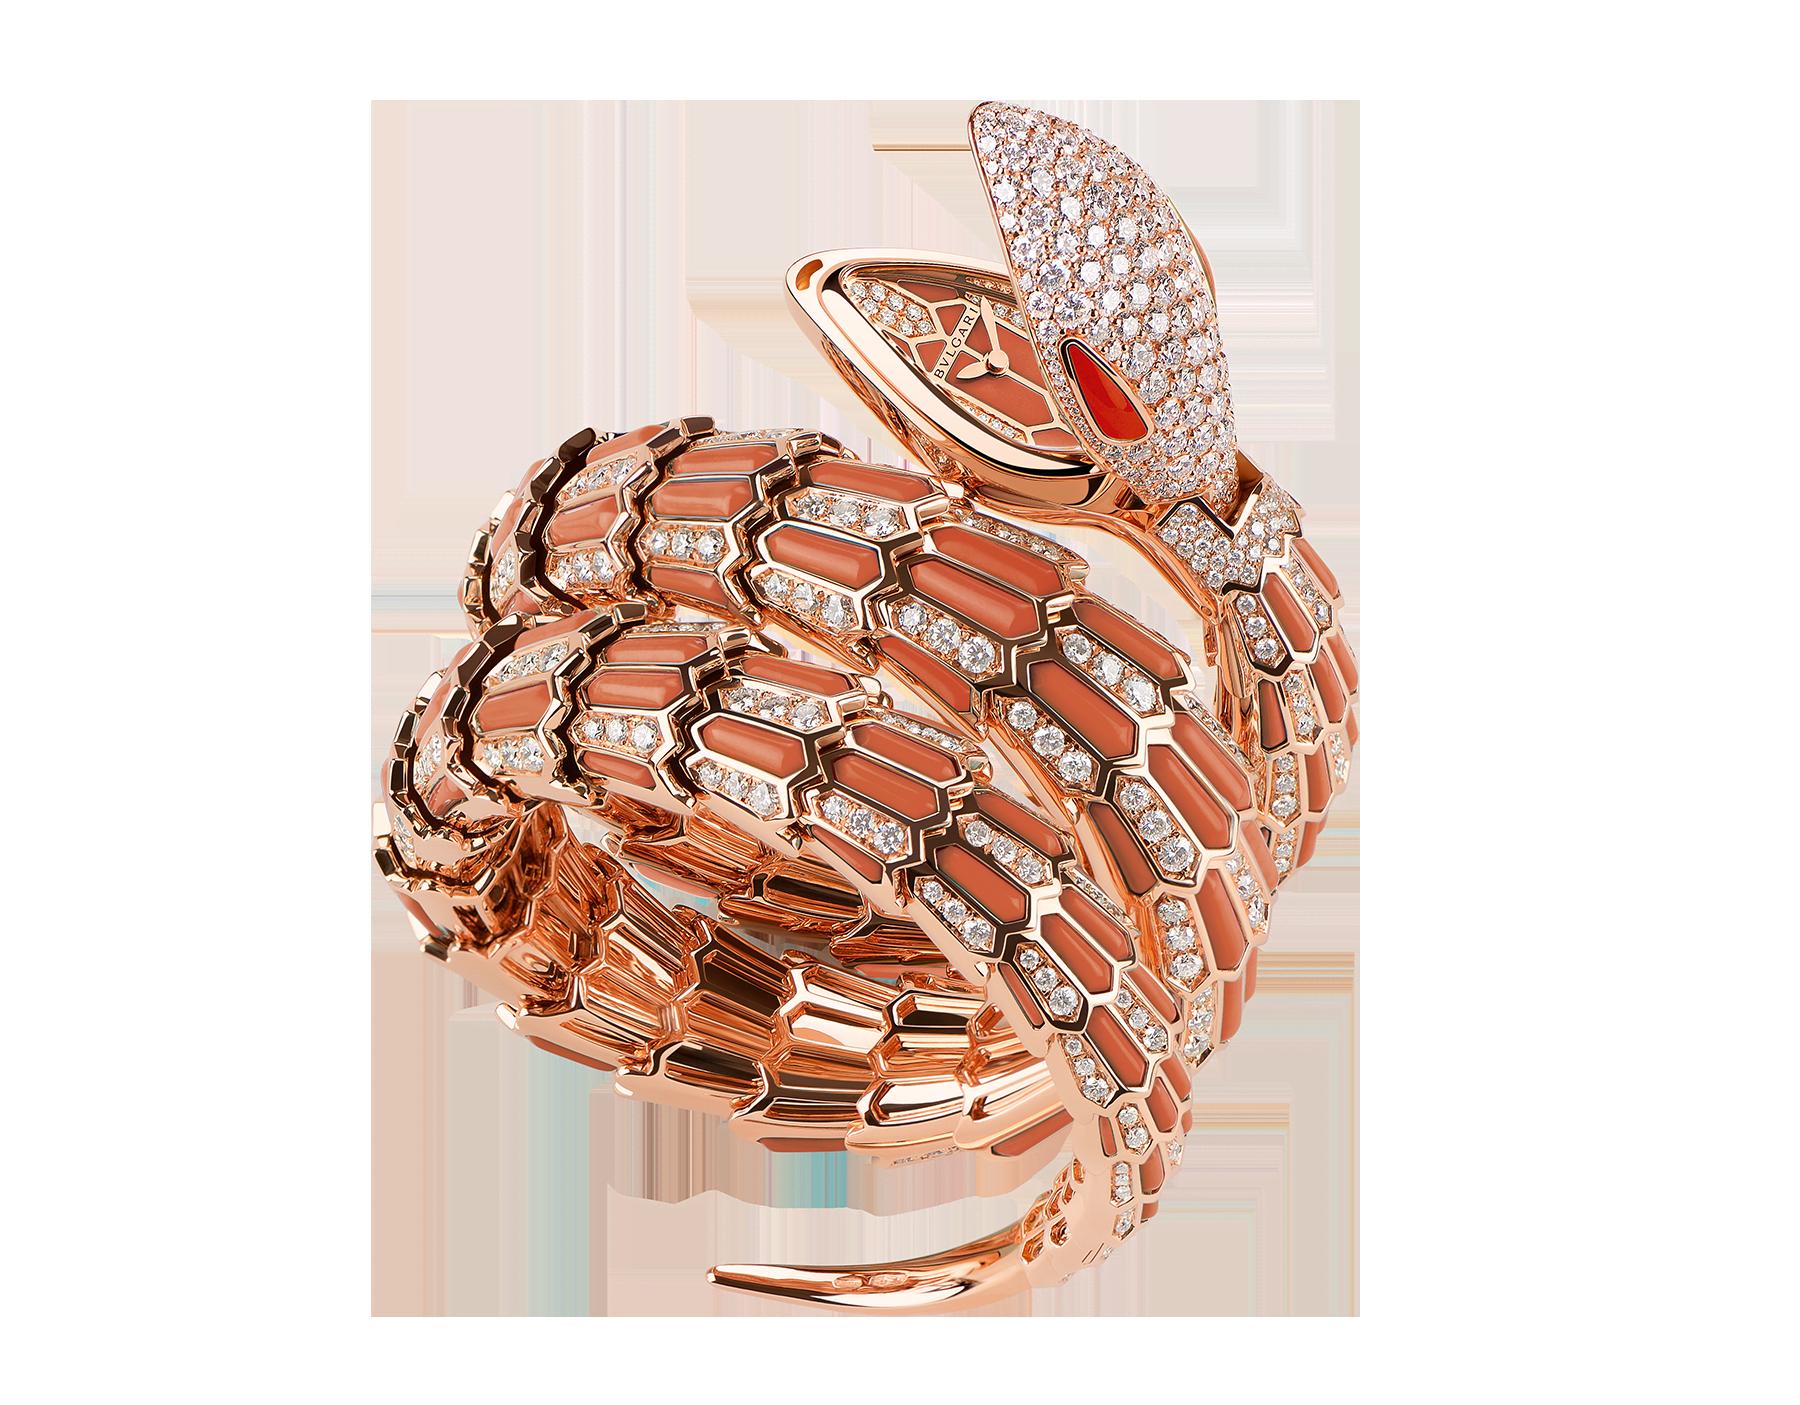 Serpenti Secret Watch 腕錶,18K 玫瑰金錶殼,18K 玫瑰金蛇頭、錶盤和雙圈螺旋錶帶鑲飾明亮型切割鑽石和珊瑚元素。 102143 image 1